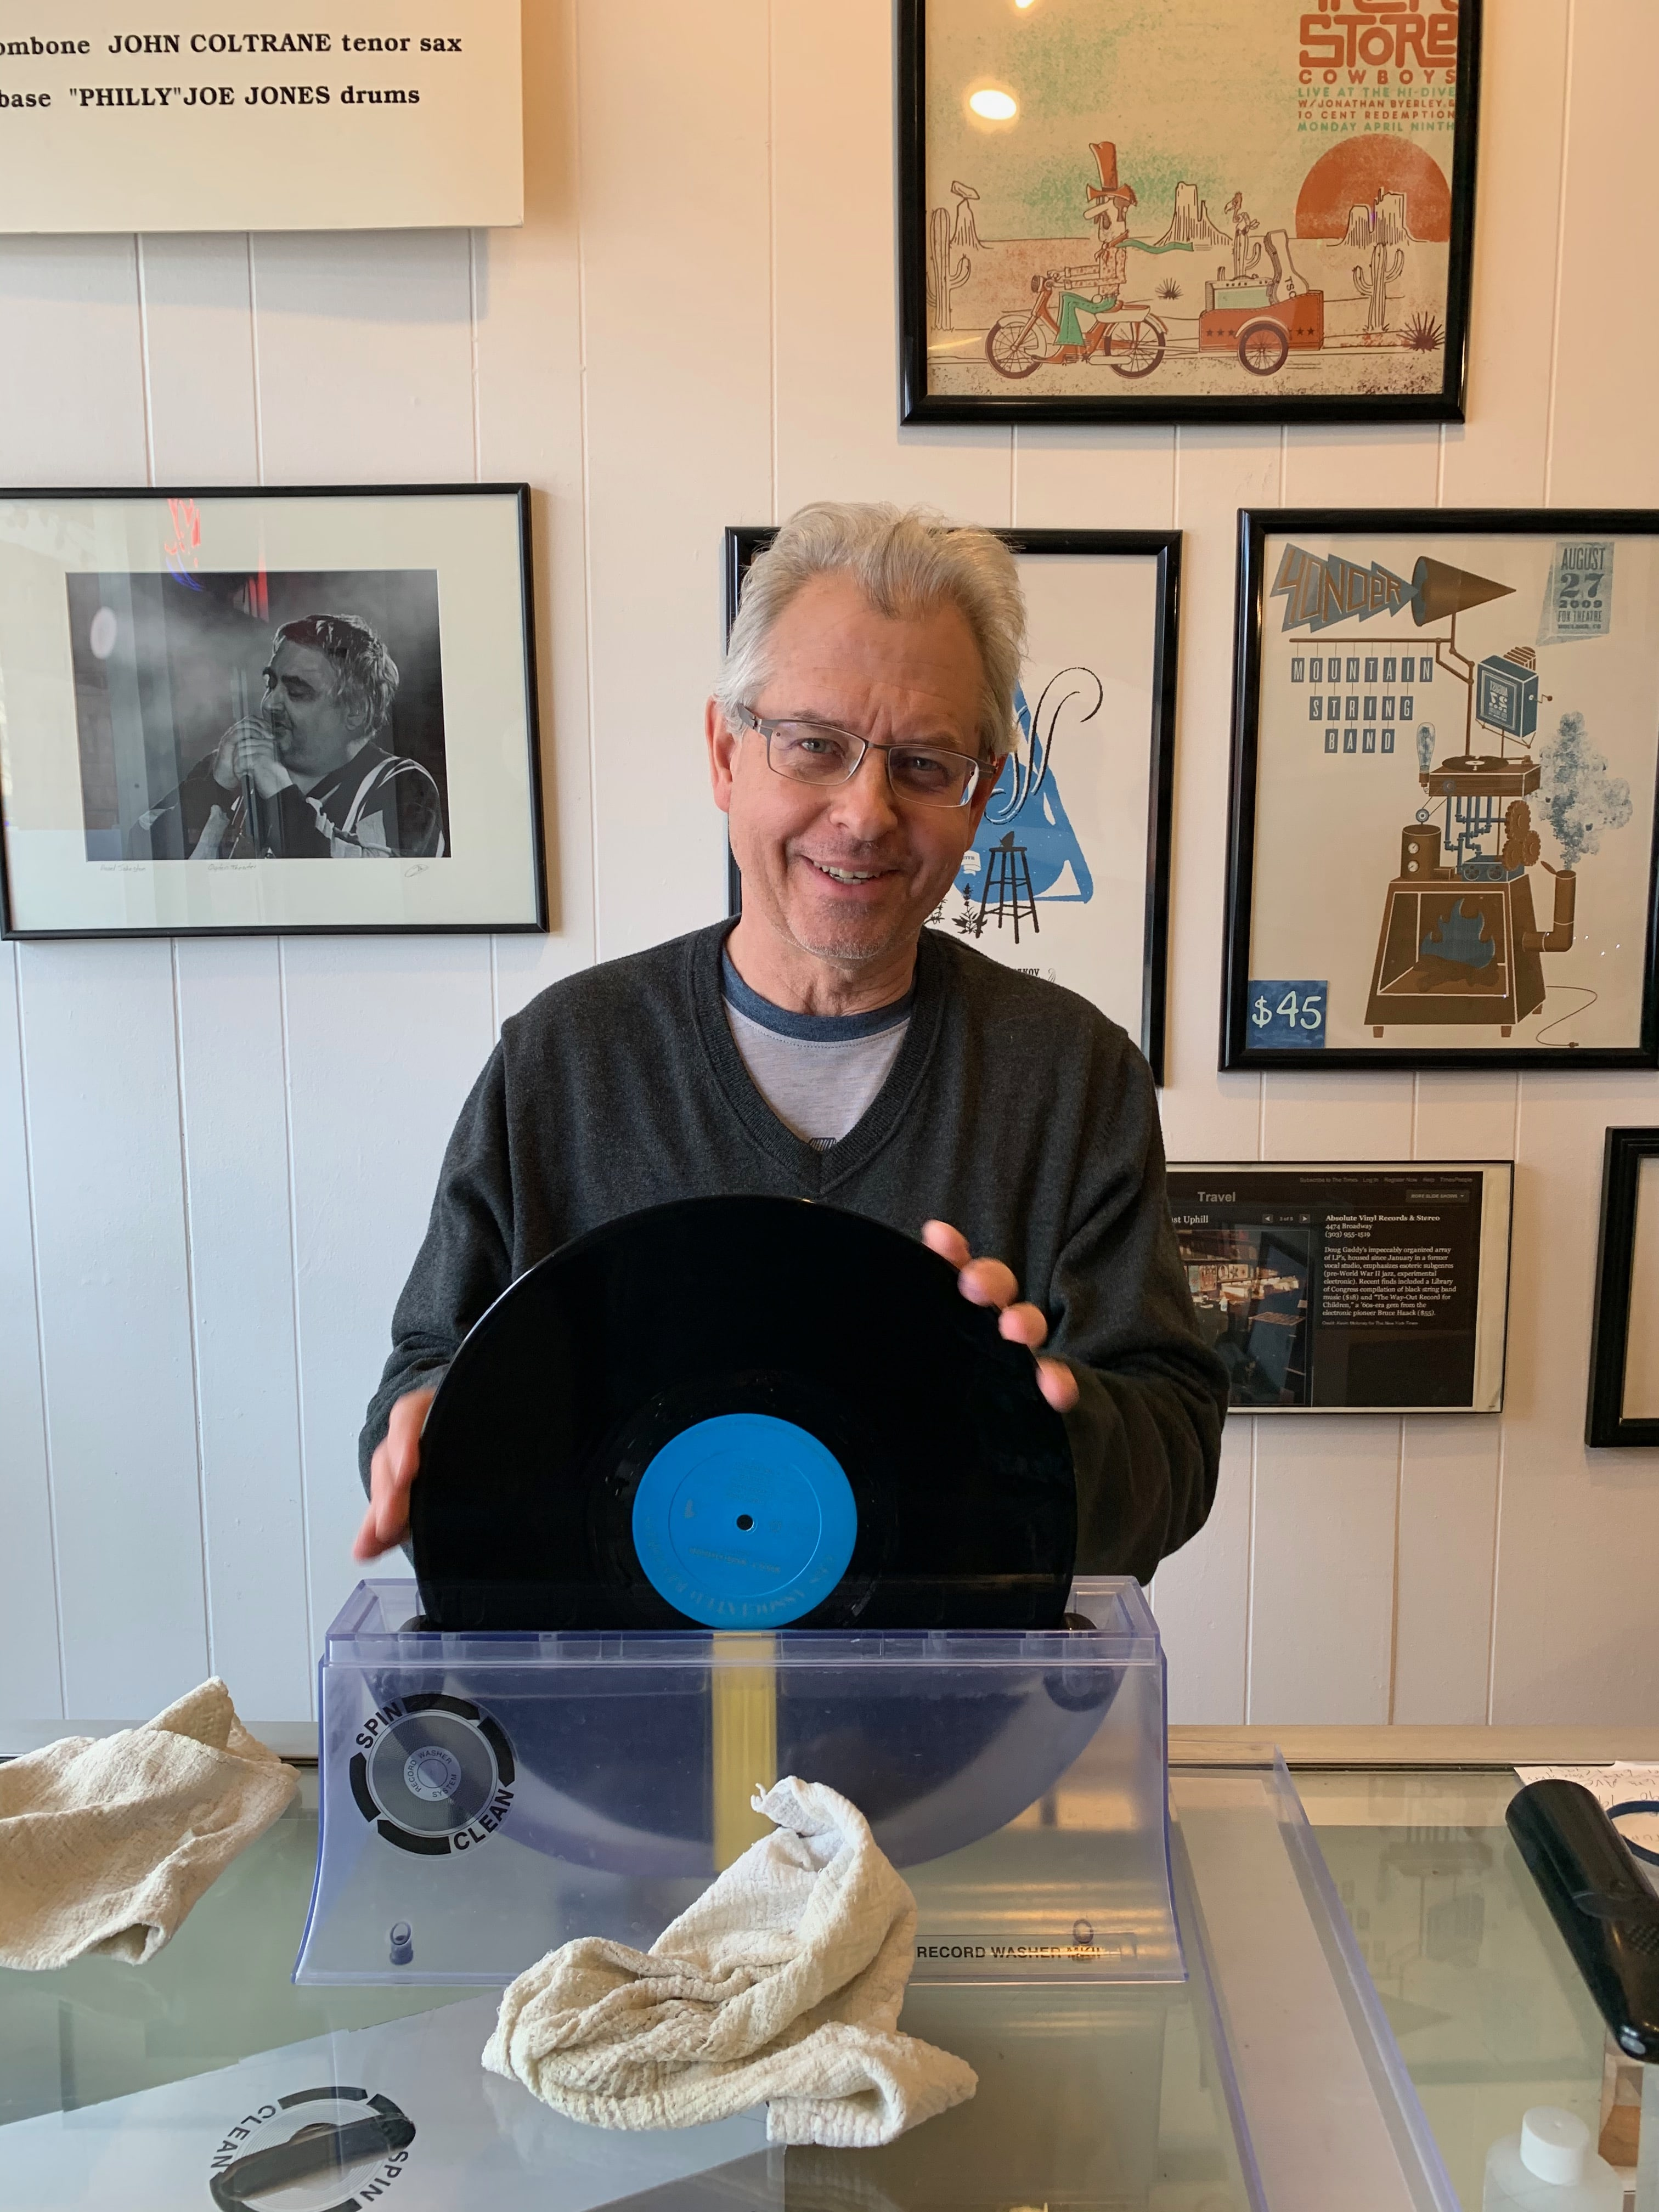 Doug Gaddy of Absolut Vinyl in Longmont, Colorado